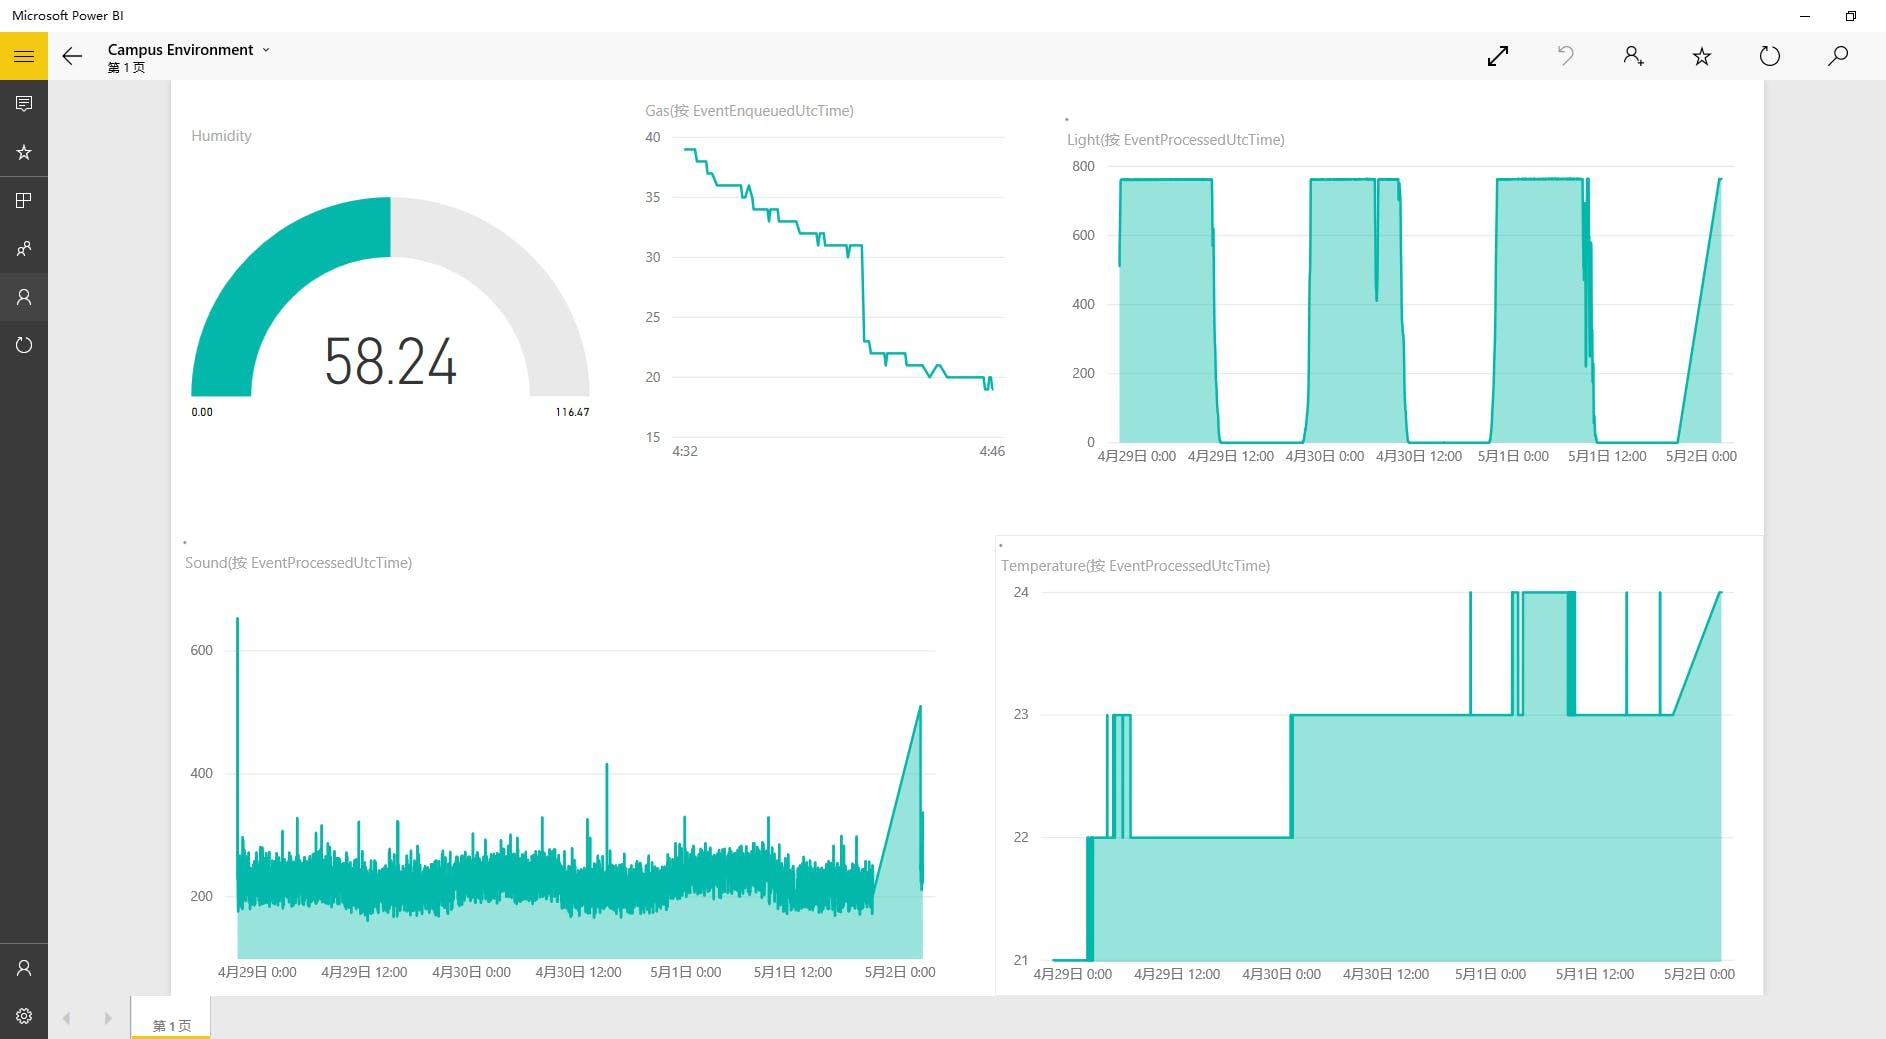 Figure 15. Power BI Desktop (with Gas data)